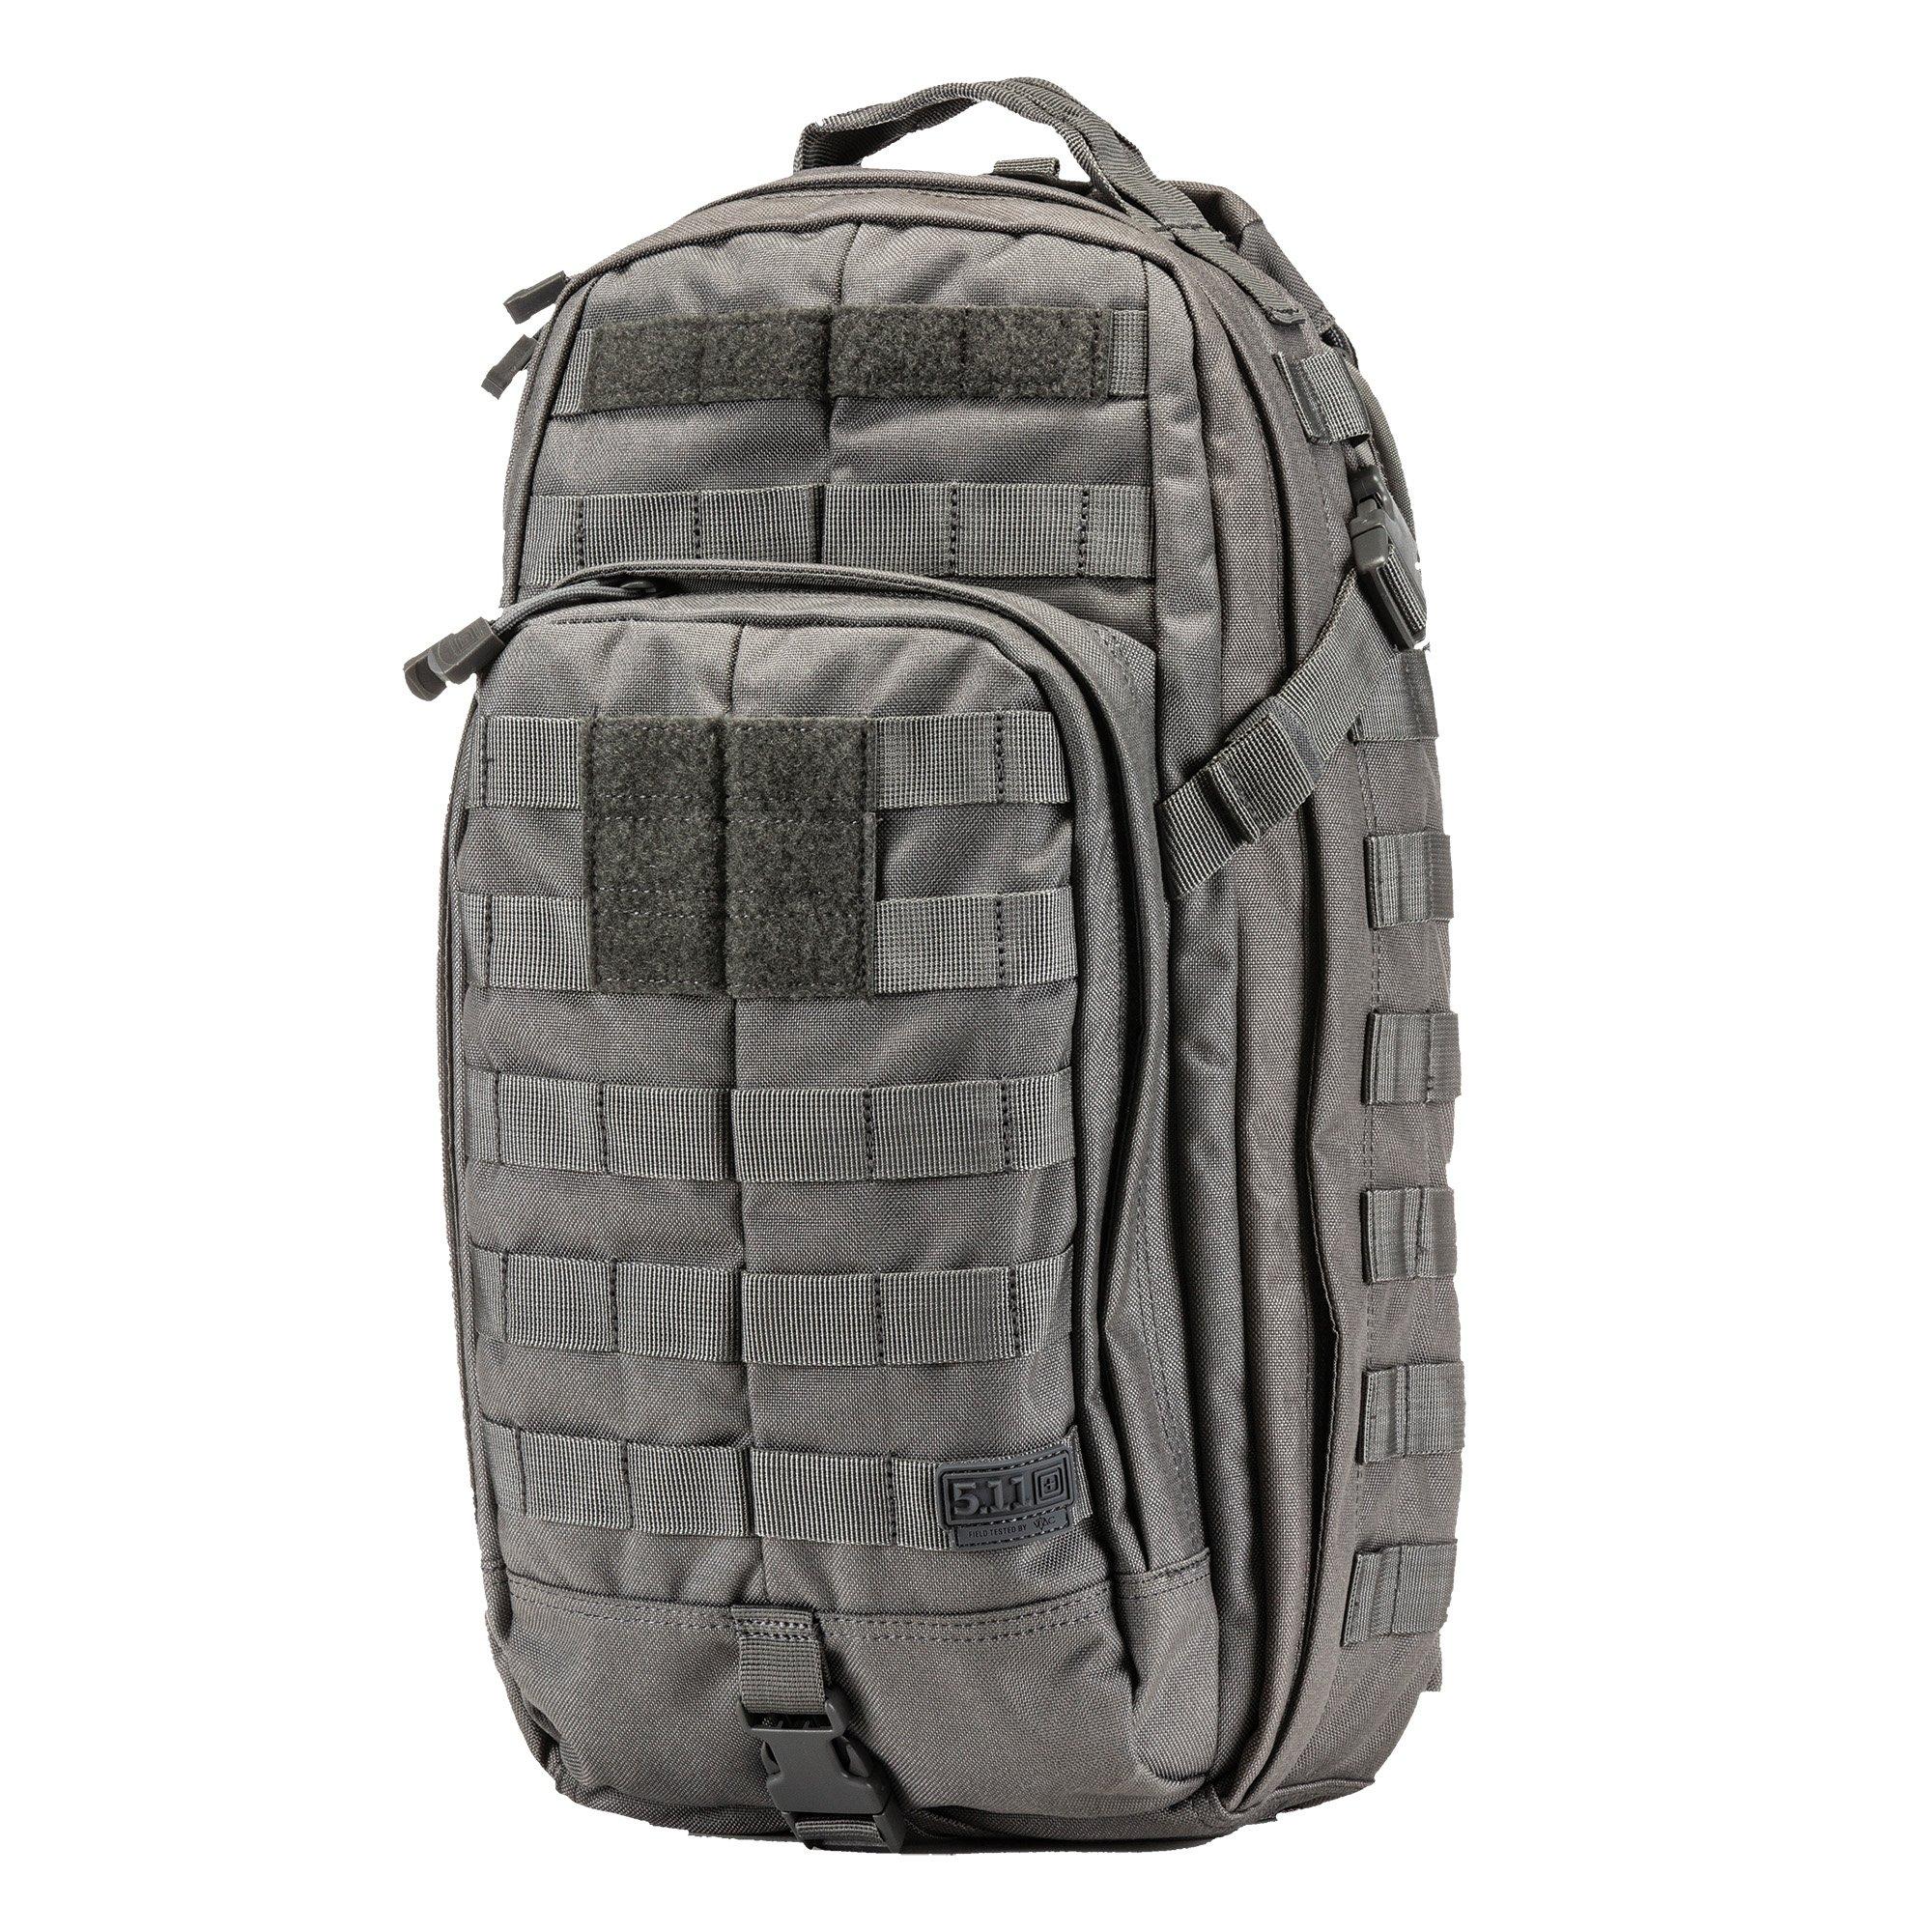 Balo 1 Quai 5.11 Tactical Moab 10